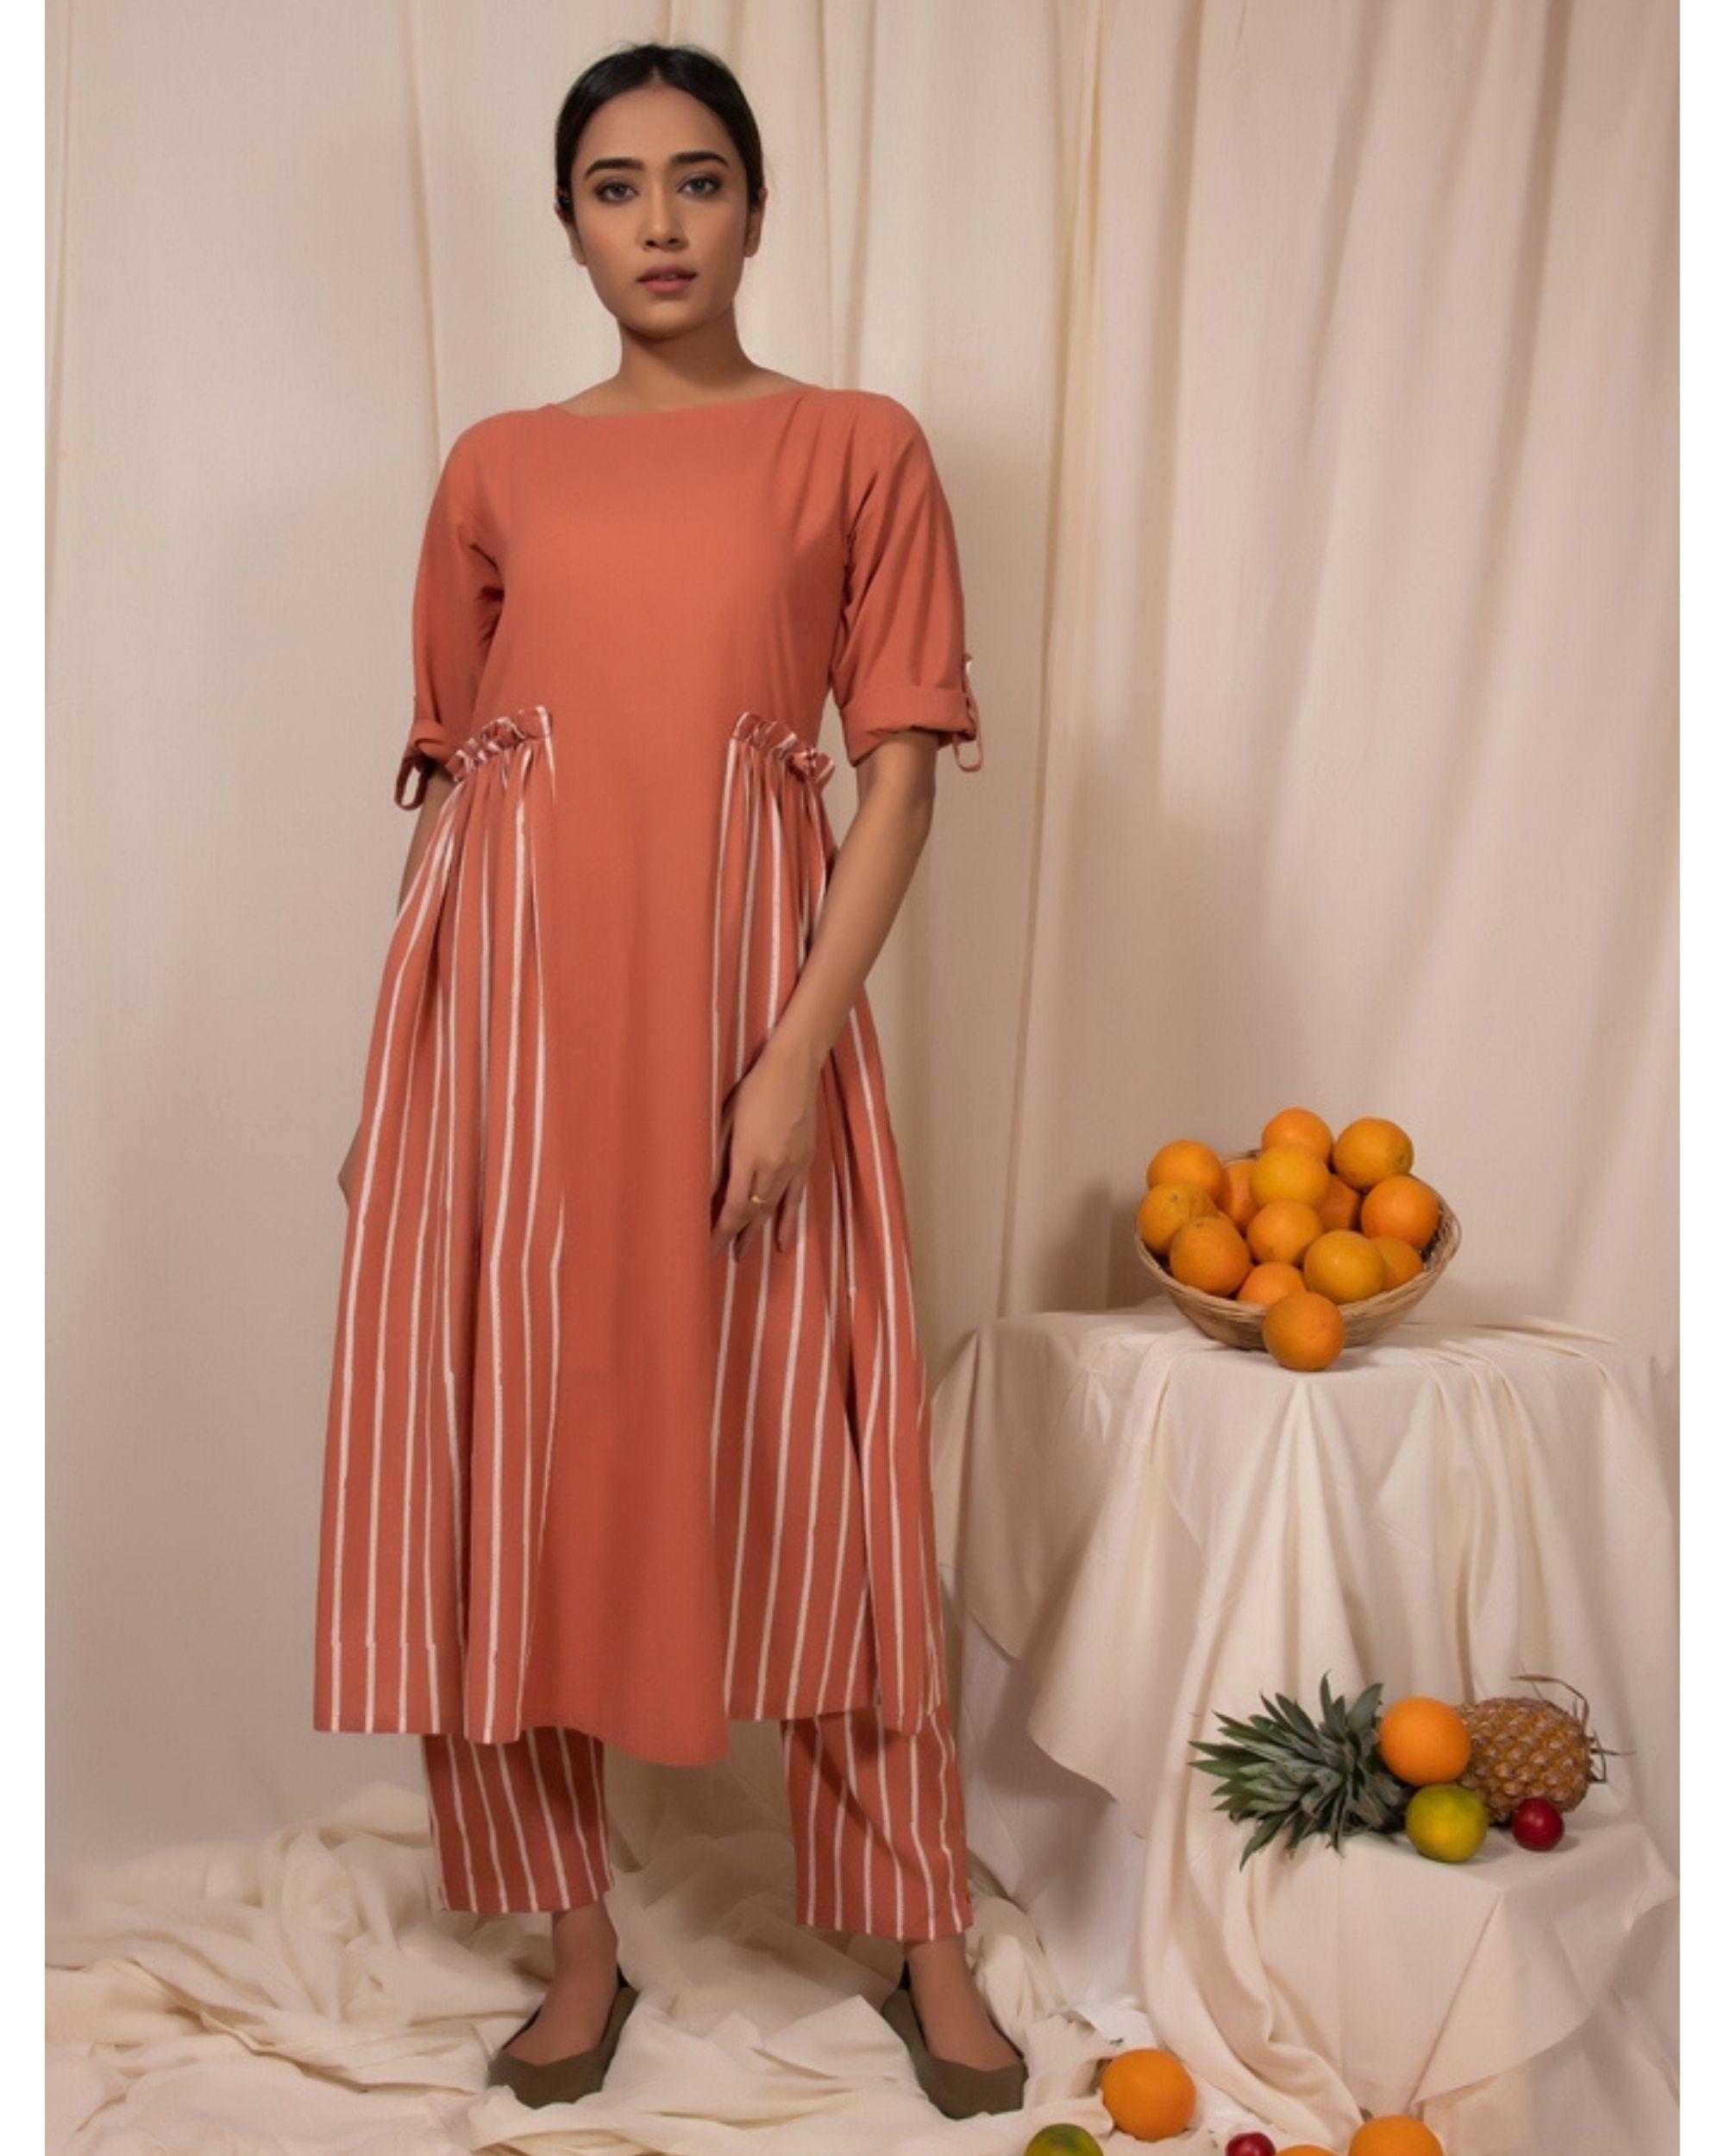 Peach striped panel dress